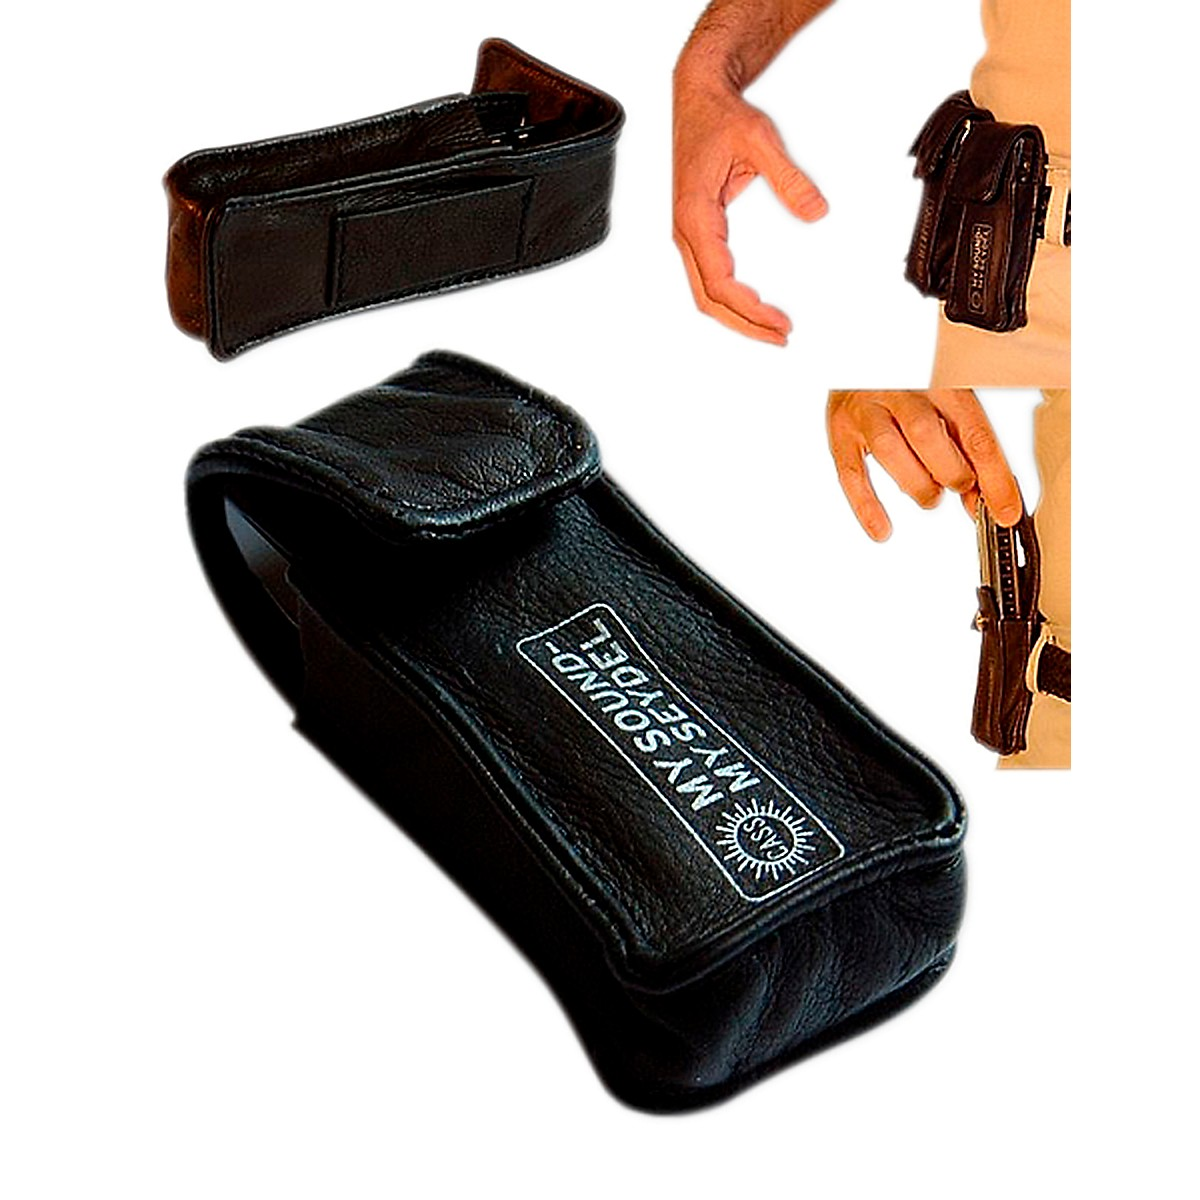 SEYDEL Leather BELT BAG for 1 Blues Harmonica